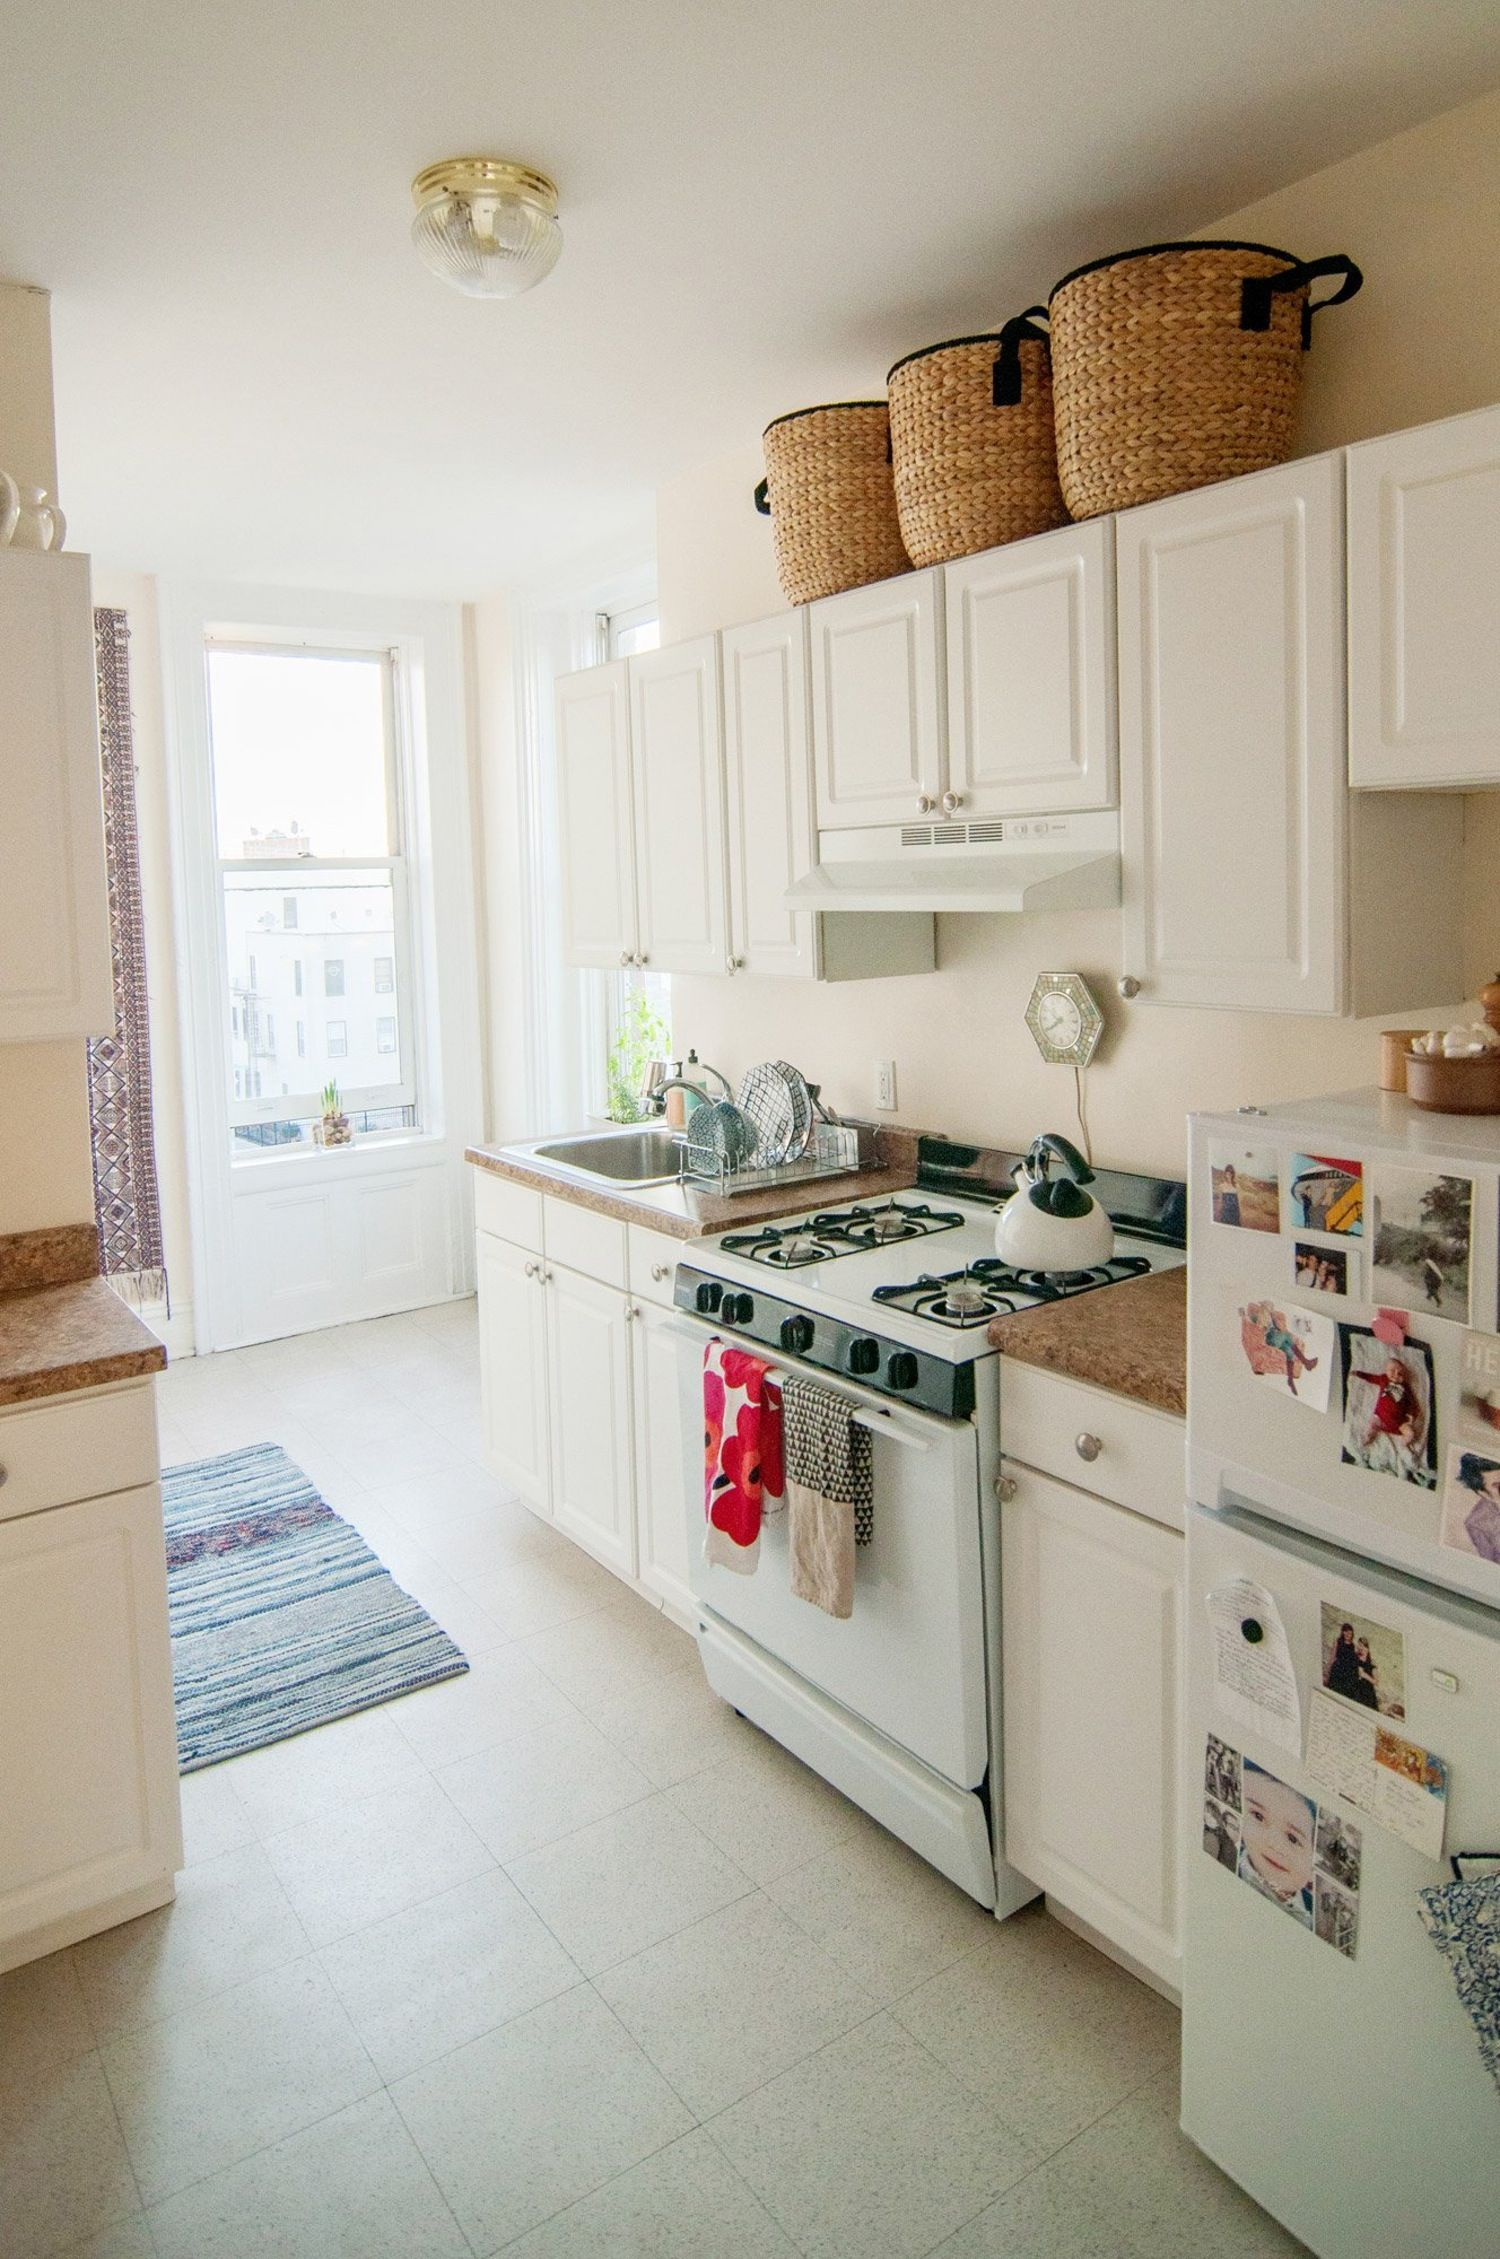 Rental Kitchen Solutions Big Baskets